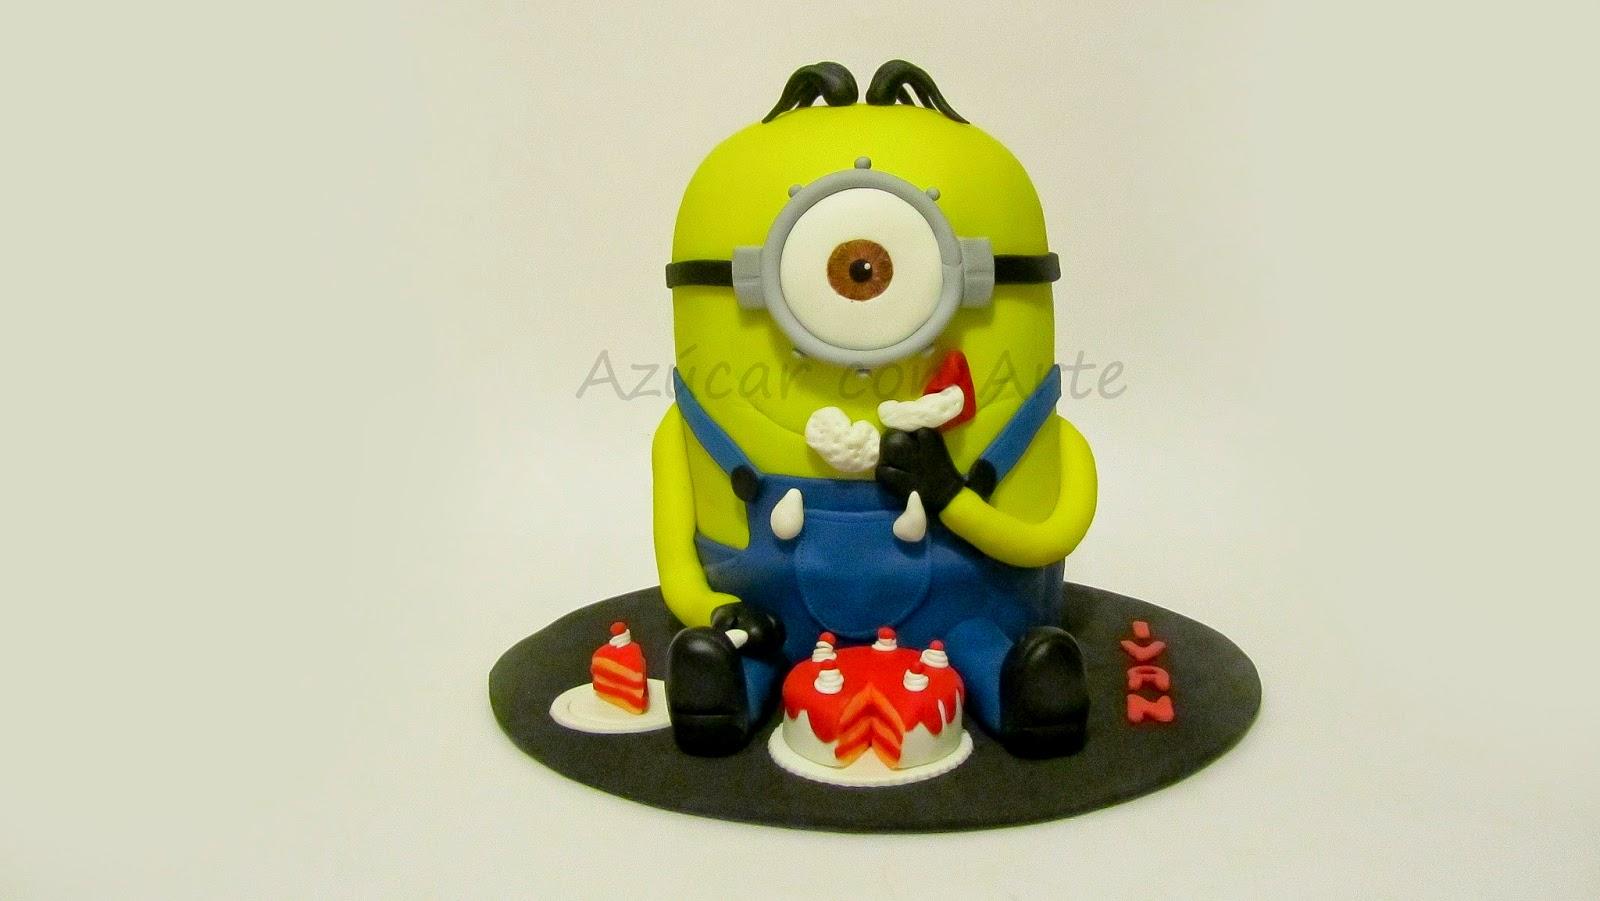 minion cake, tarta minio, tarta sin gluten, gluten free cake|azucar con arte